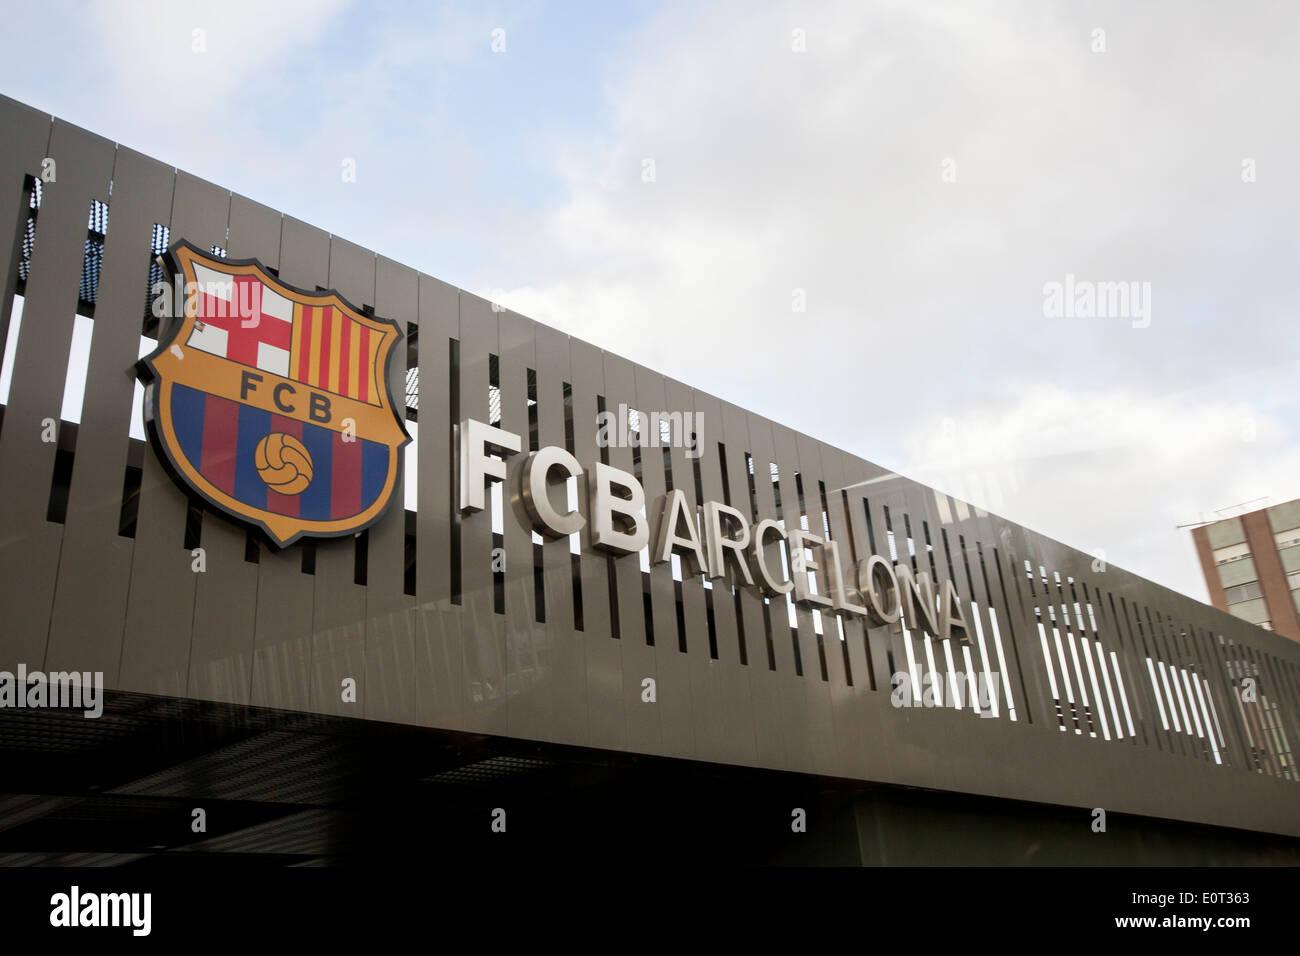 Entrance at the FC Barcelona stadium - Stock Image